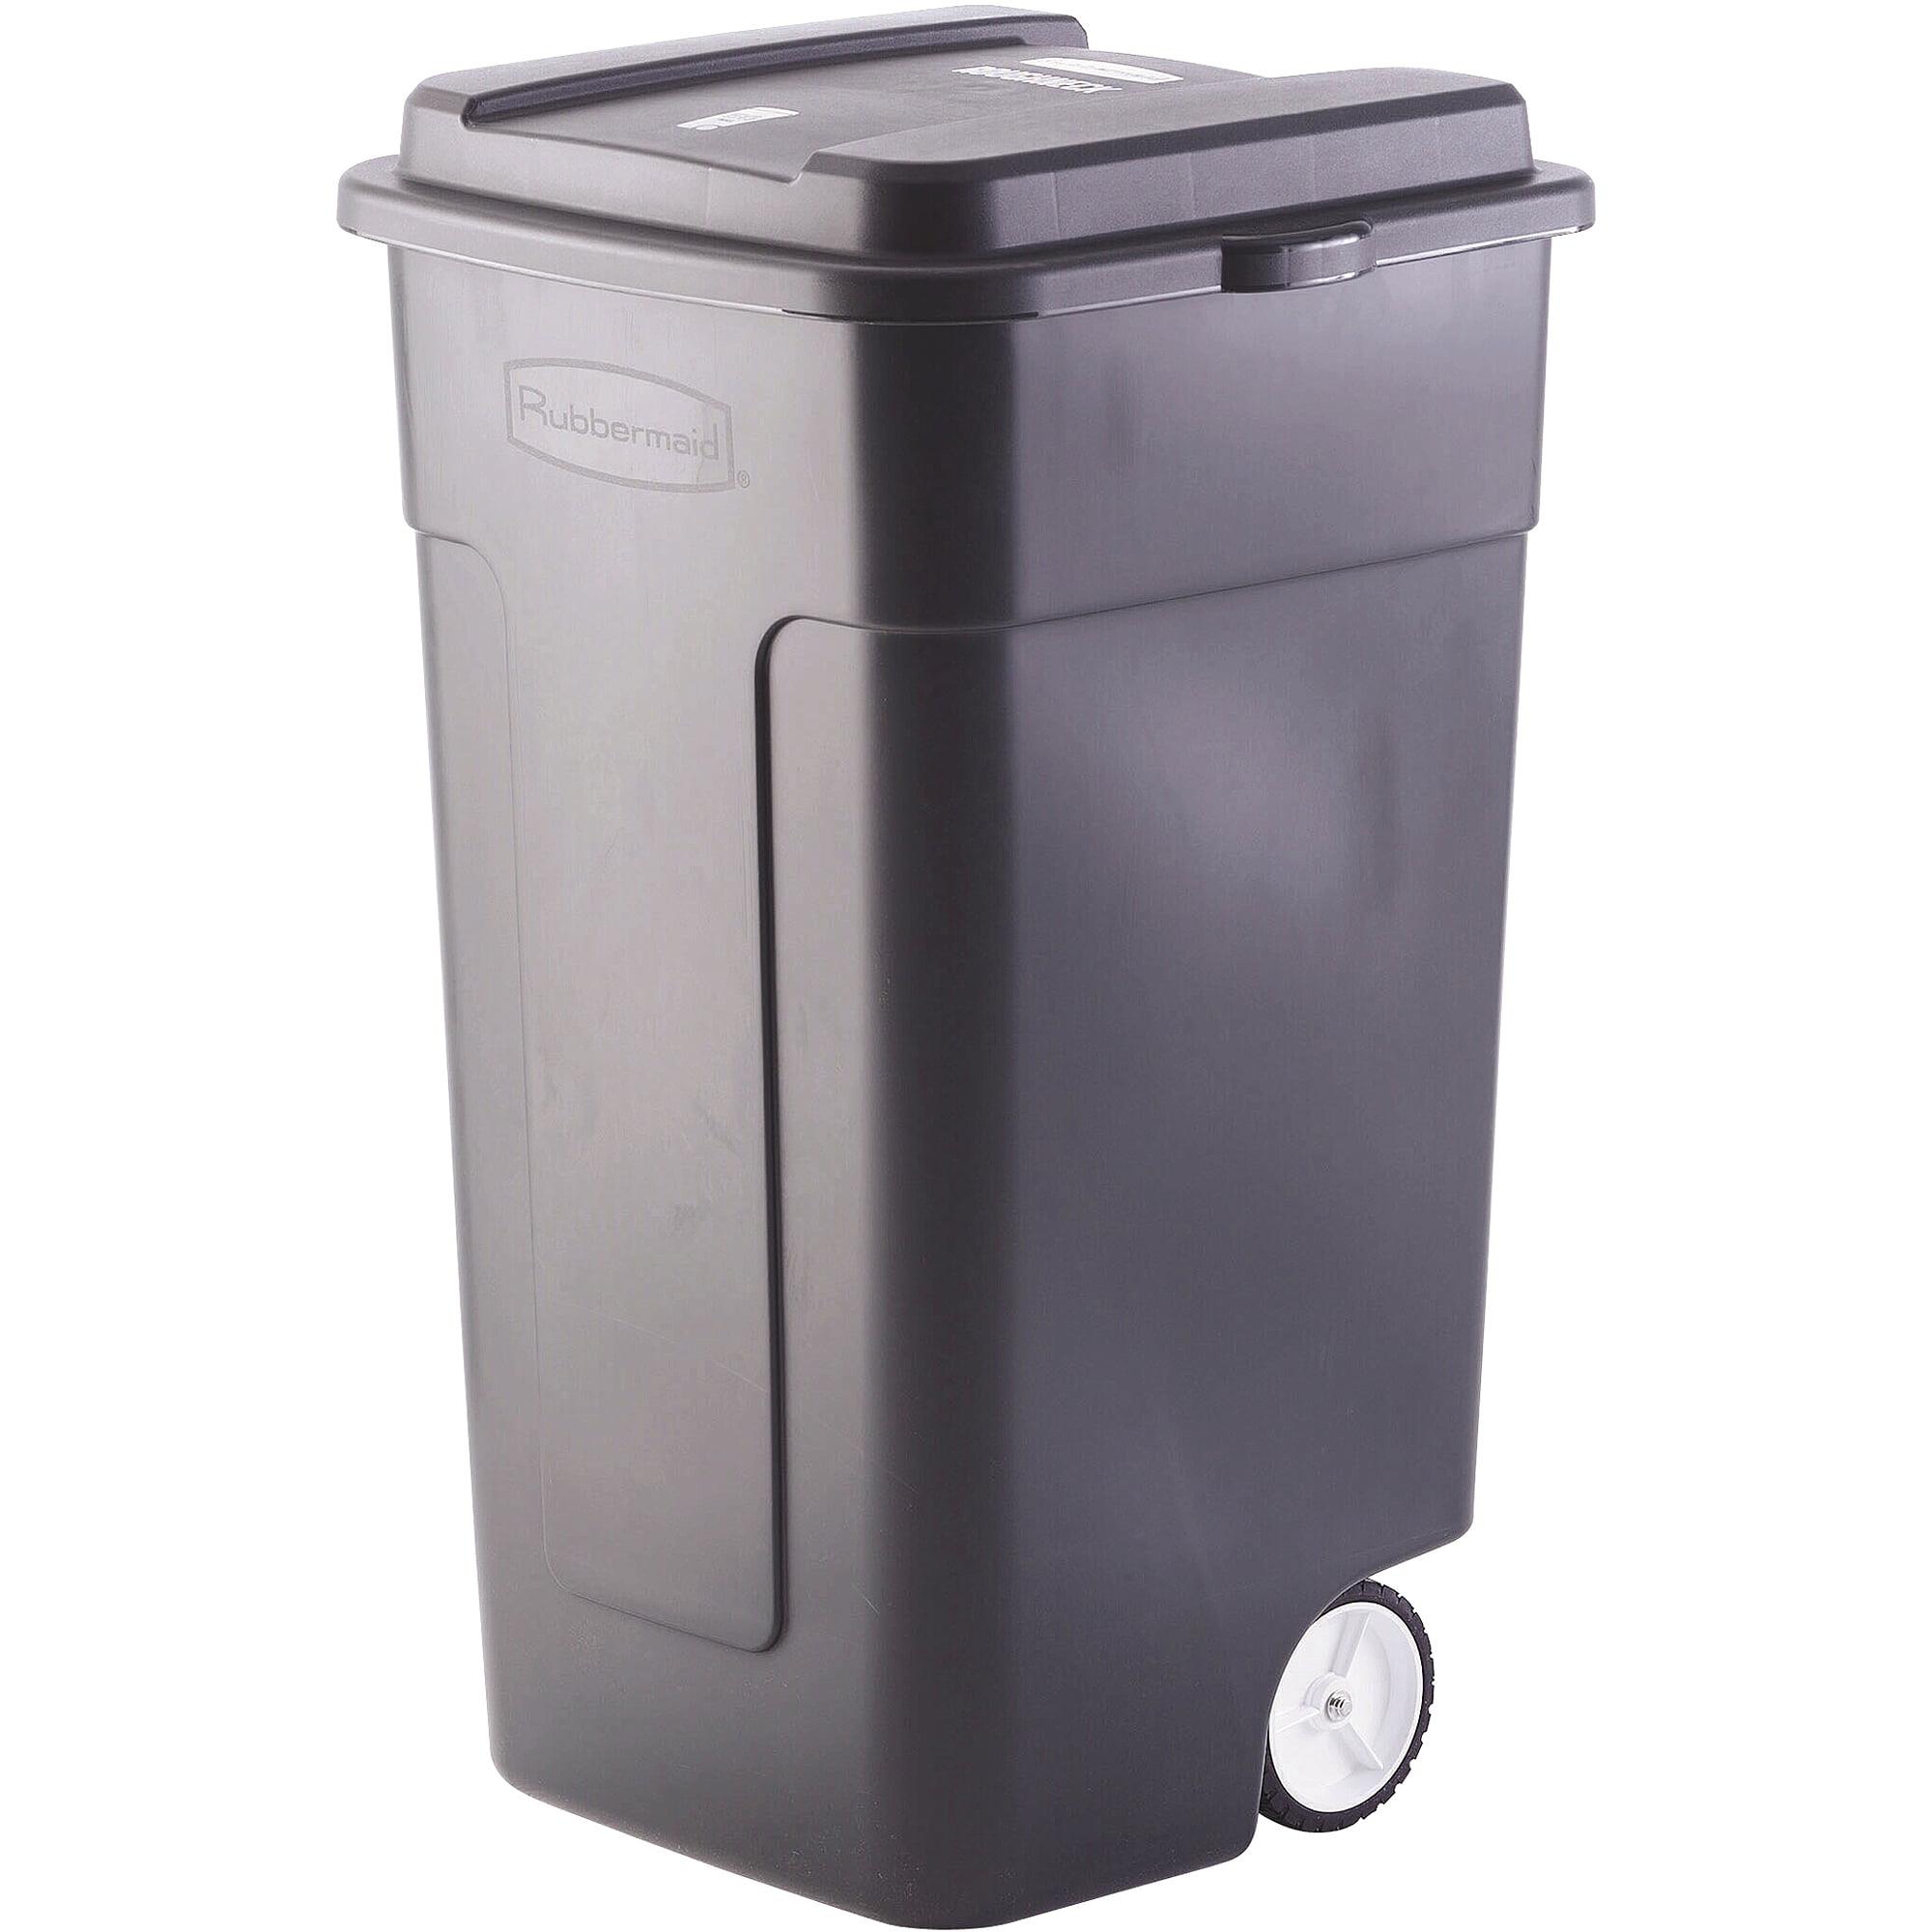 Rubbermaid 50-Gallon Wheeled Roughneck Trashcan, Black, FG285100BLA